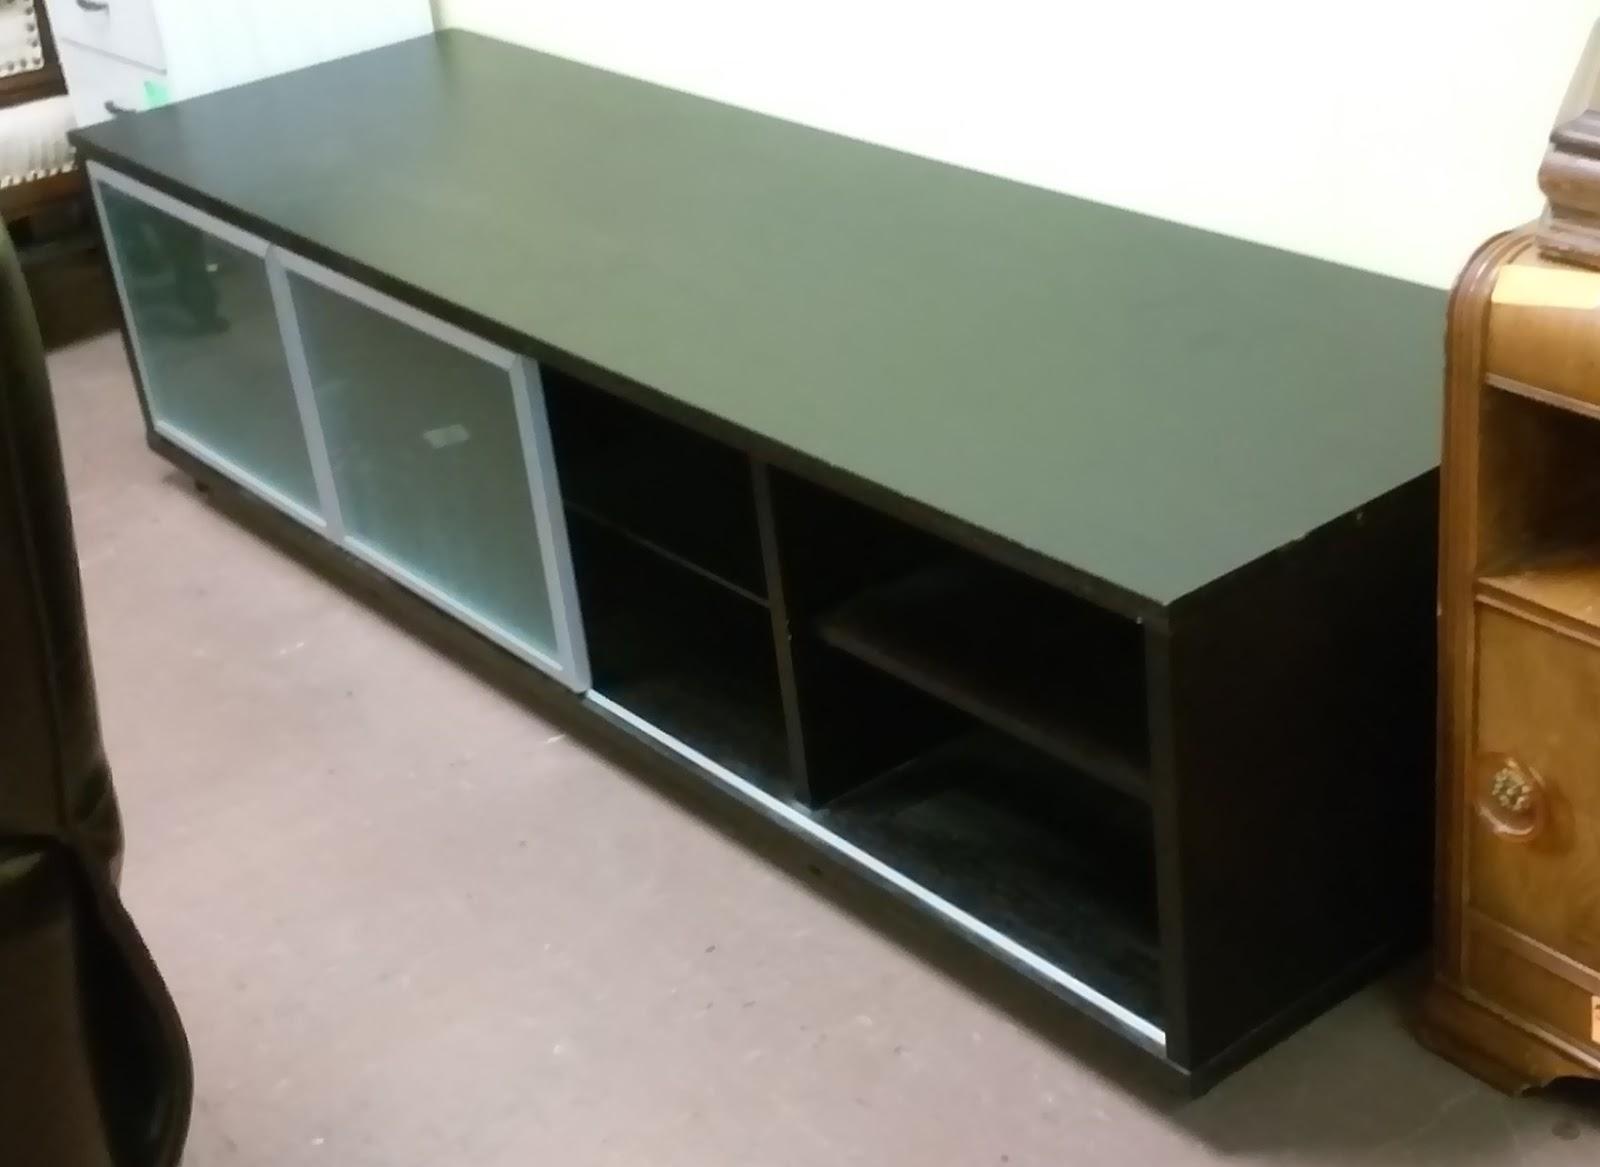 uhuru furniture collectibles sold reduced 75 long espresso ikea tv stand 45. Black Bedroom Furniture Sets. Home Design Ideas